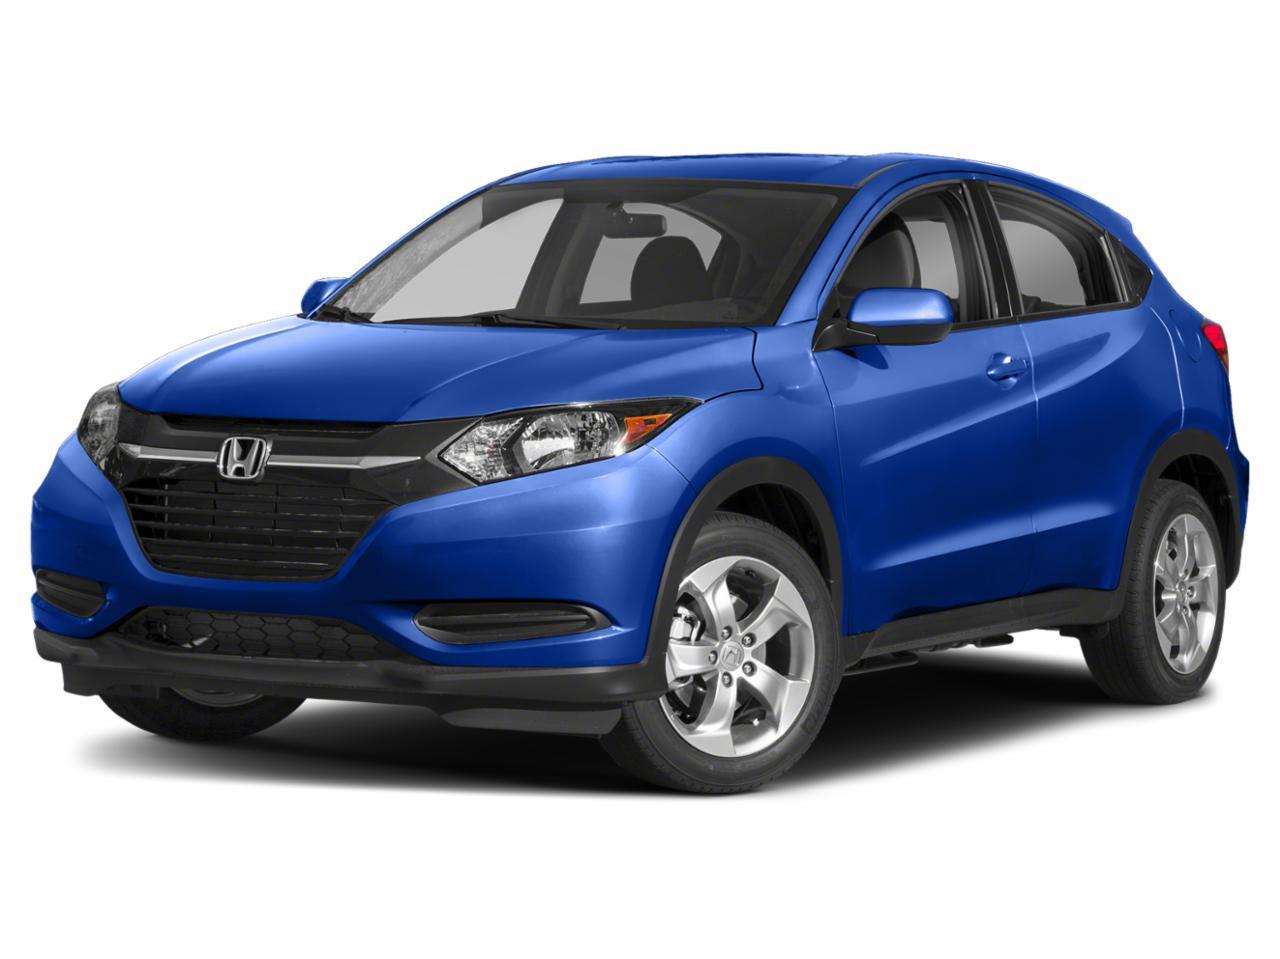 2018 Honda HR-V Vehicle Photo in Mansfield, OH 44906